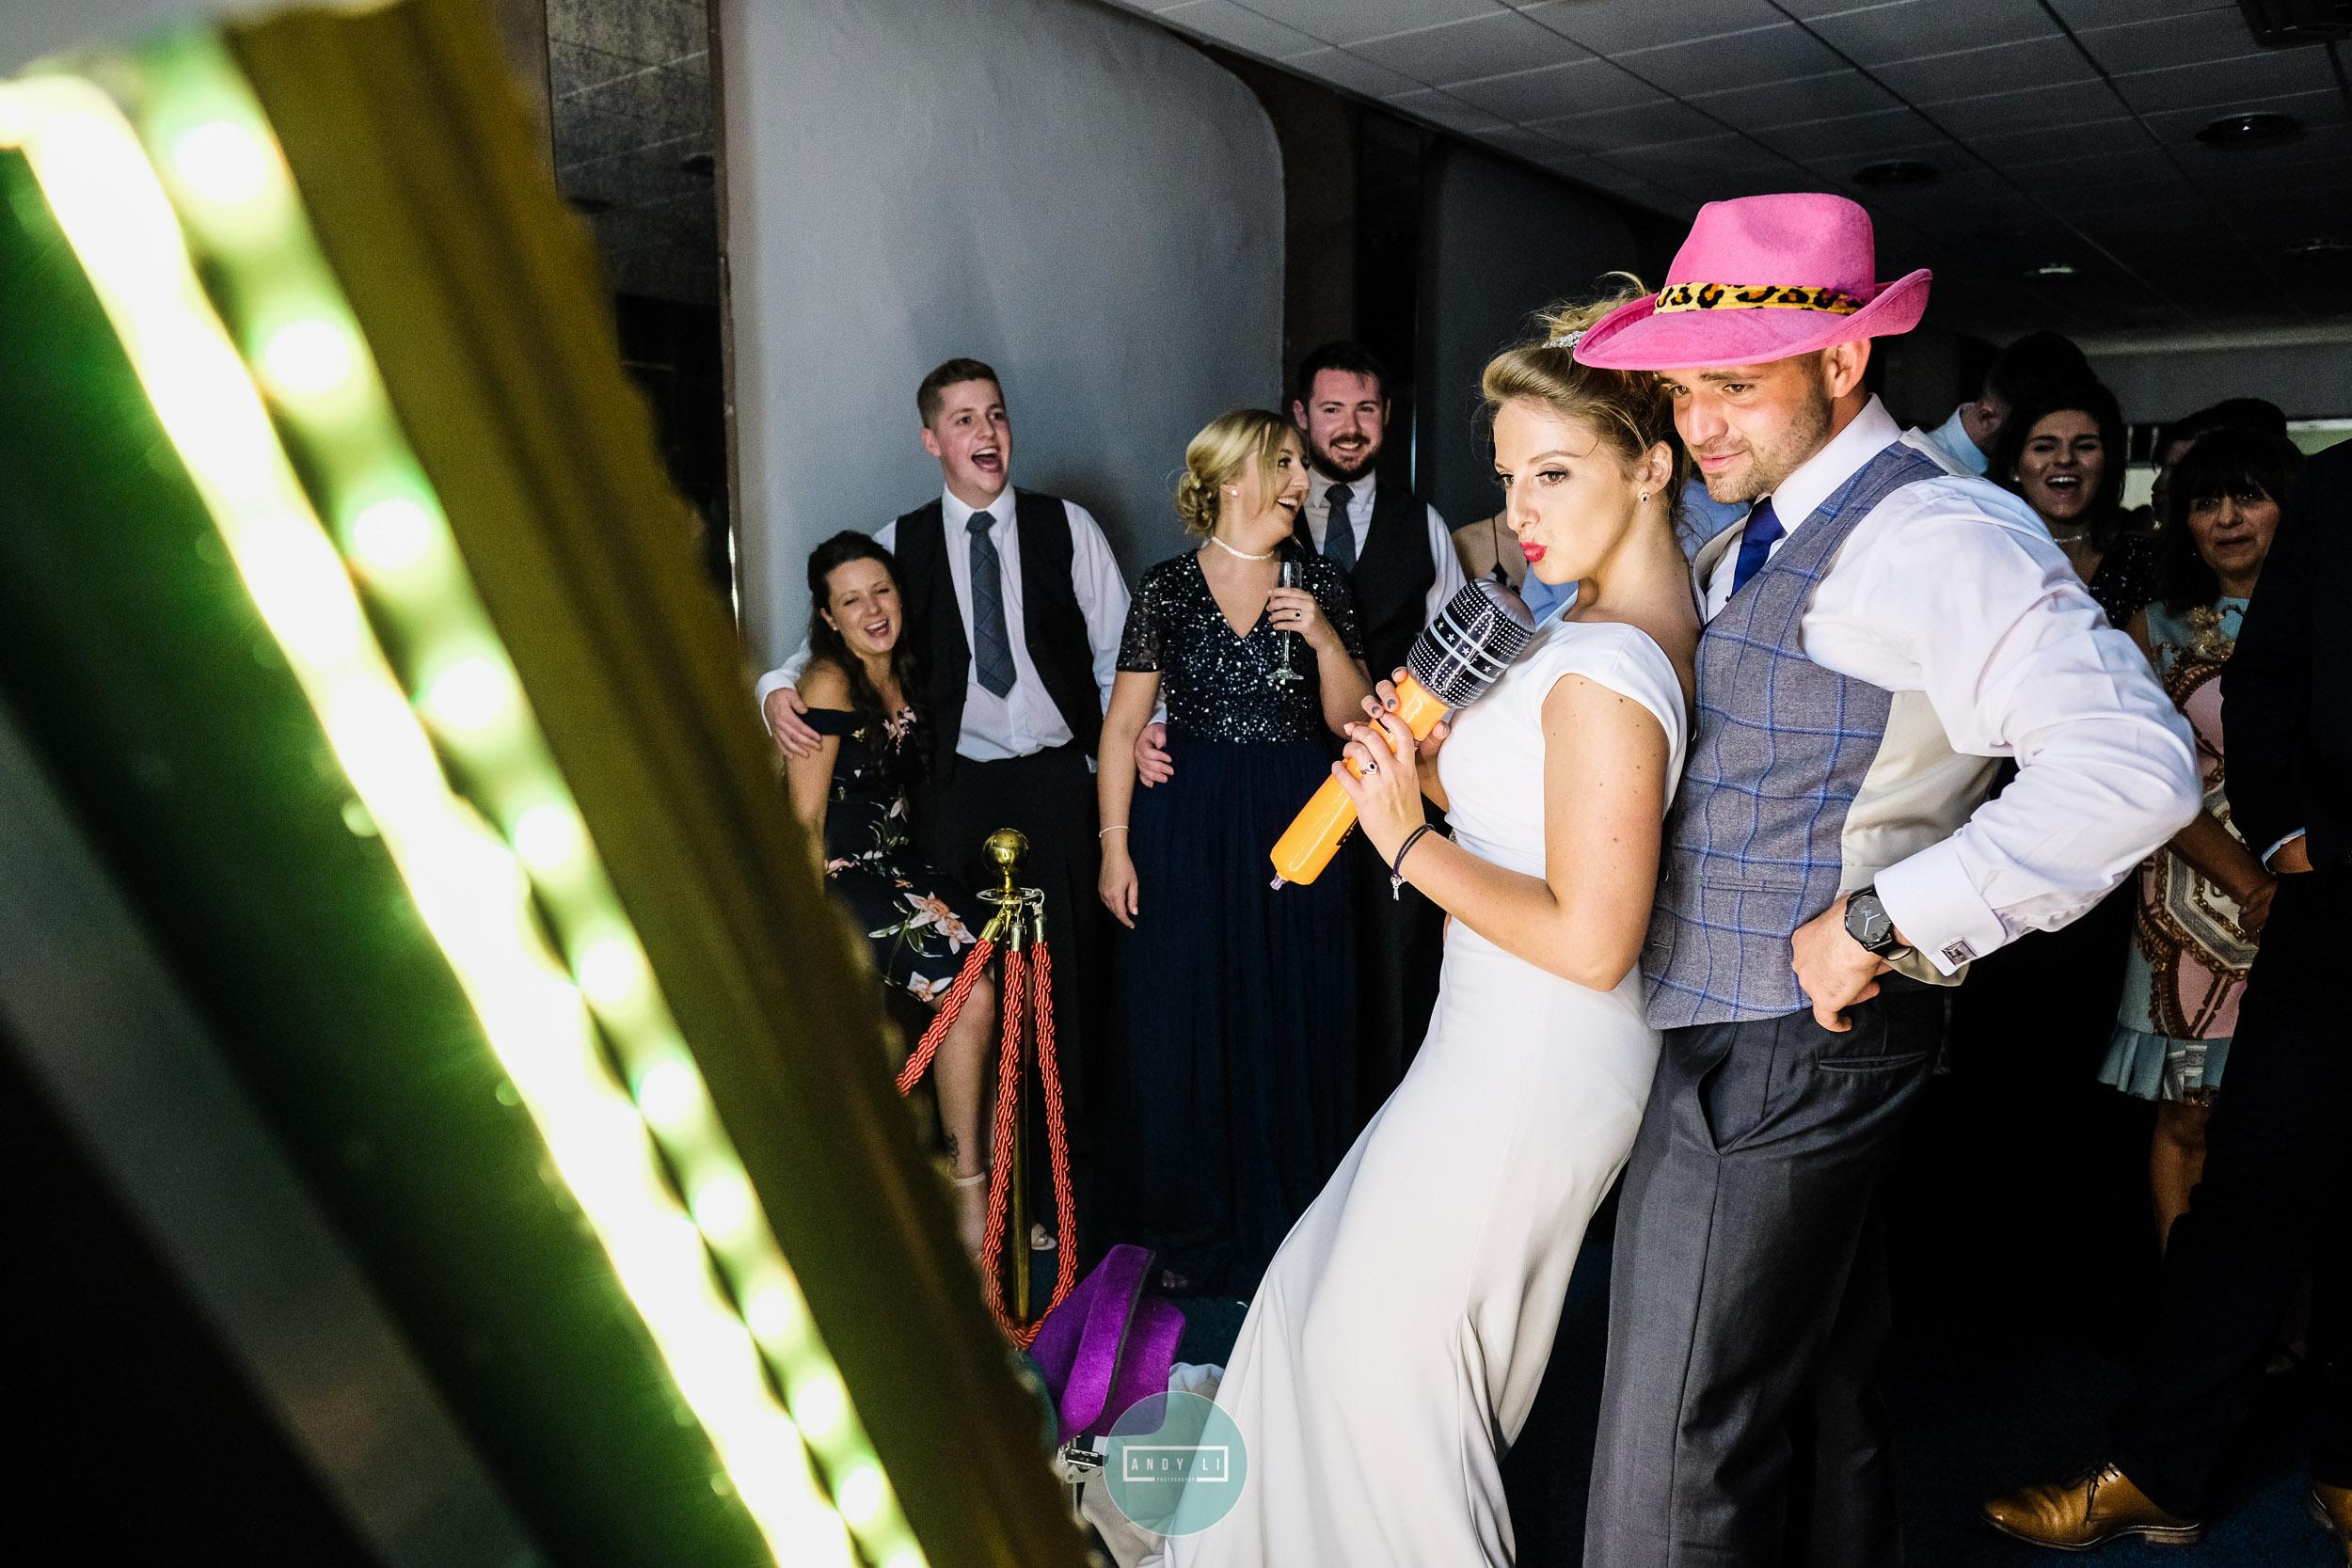 Lilleshall Hall Wedding Photographer-076-XPRO1829.jpg